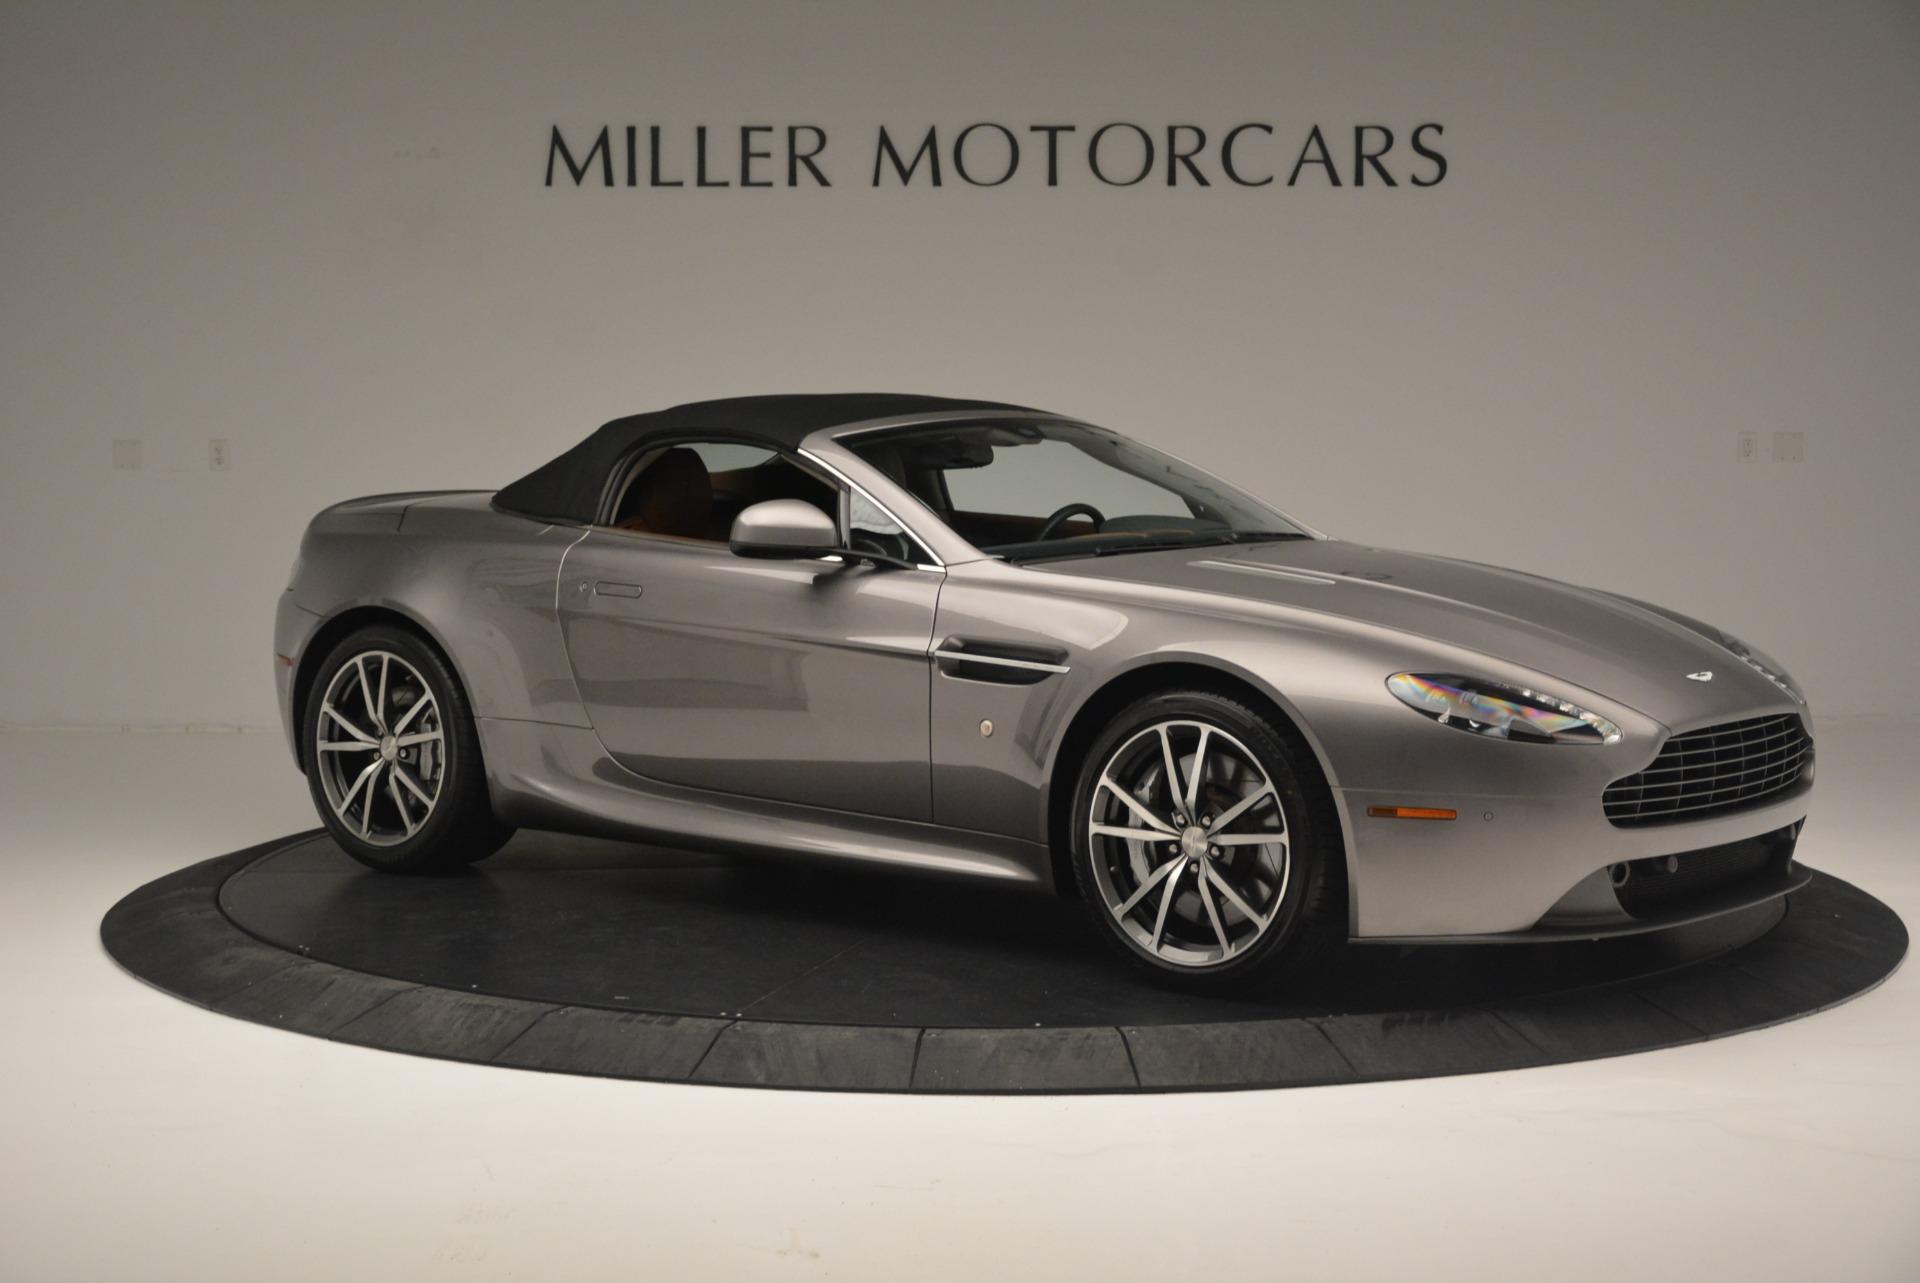 Used 2015 Aston Martin V8 Vantage Roadster For Sale In Greenwich, CT. Alfa Romeo of Greenwich, 7396 2463_p17